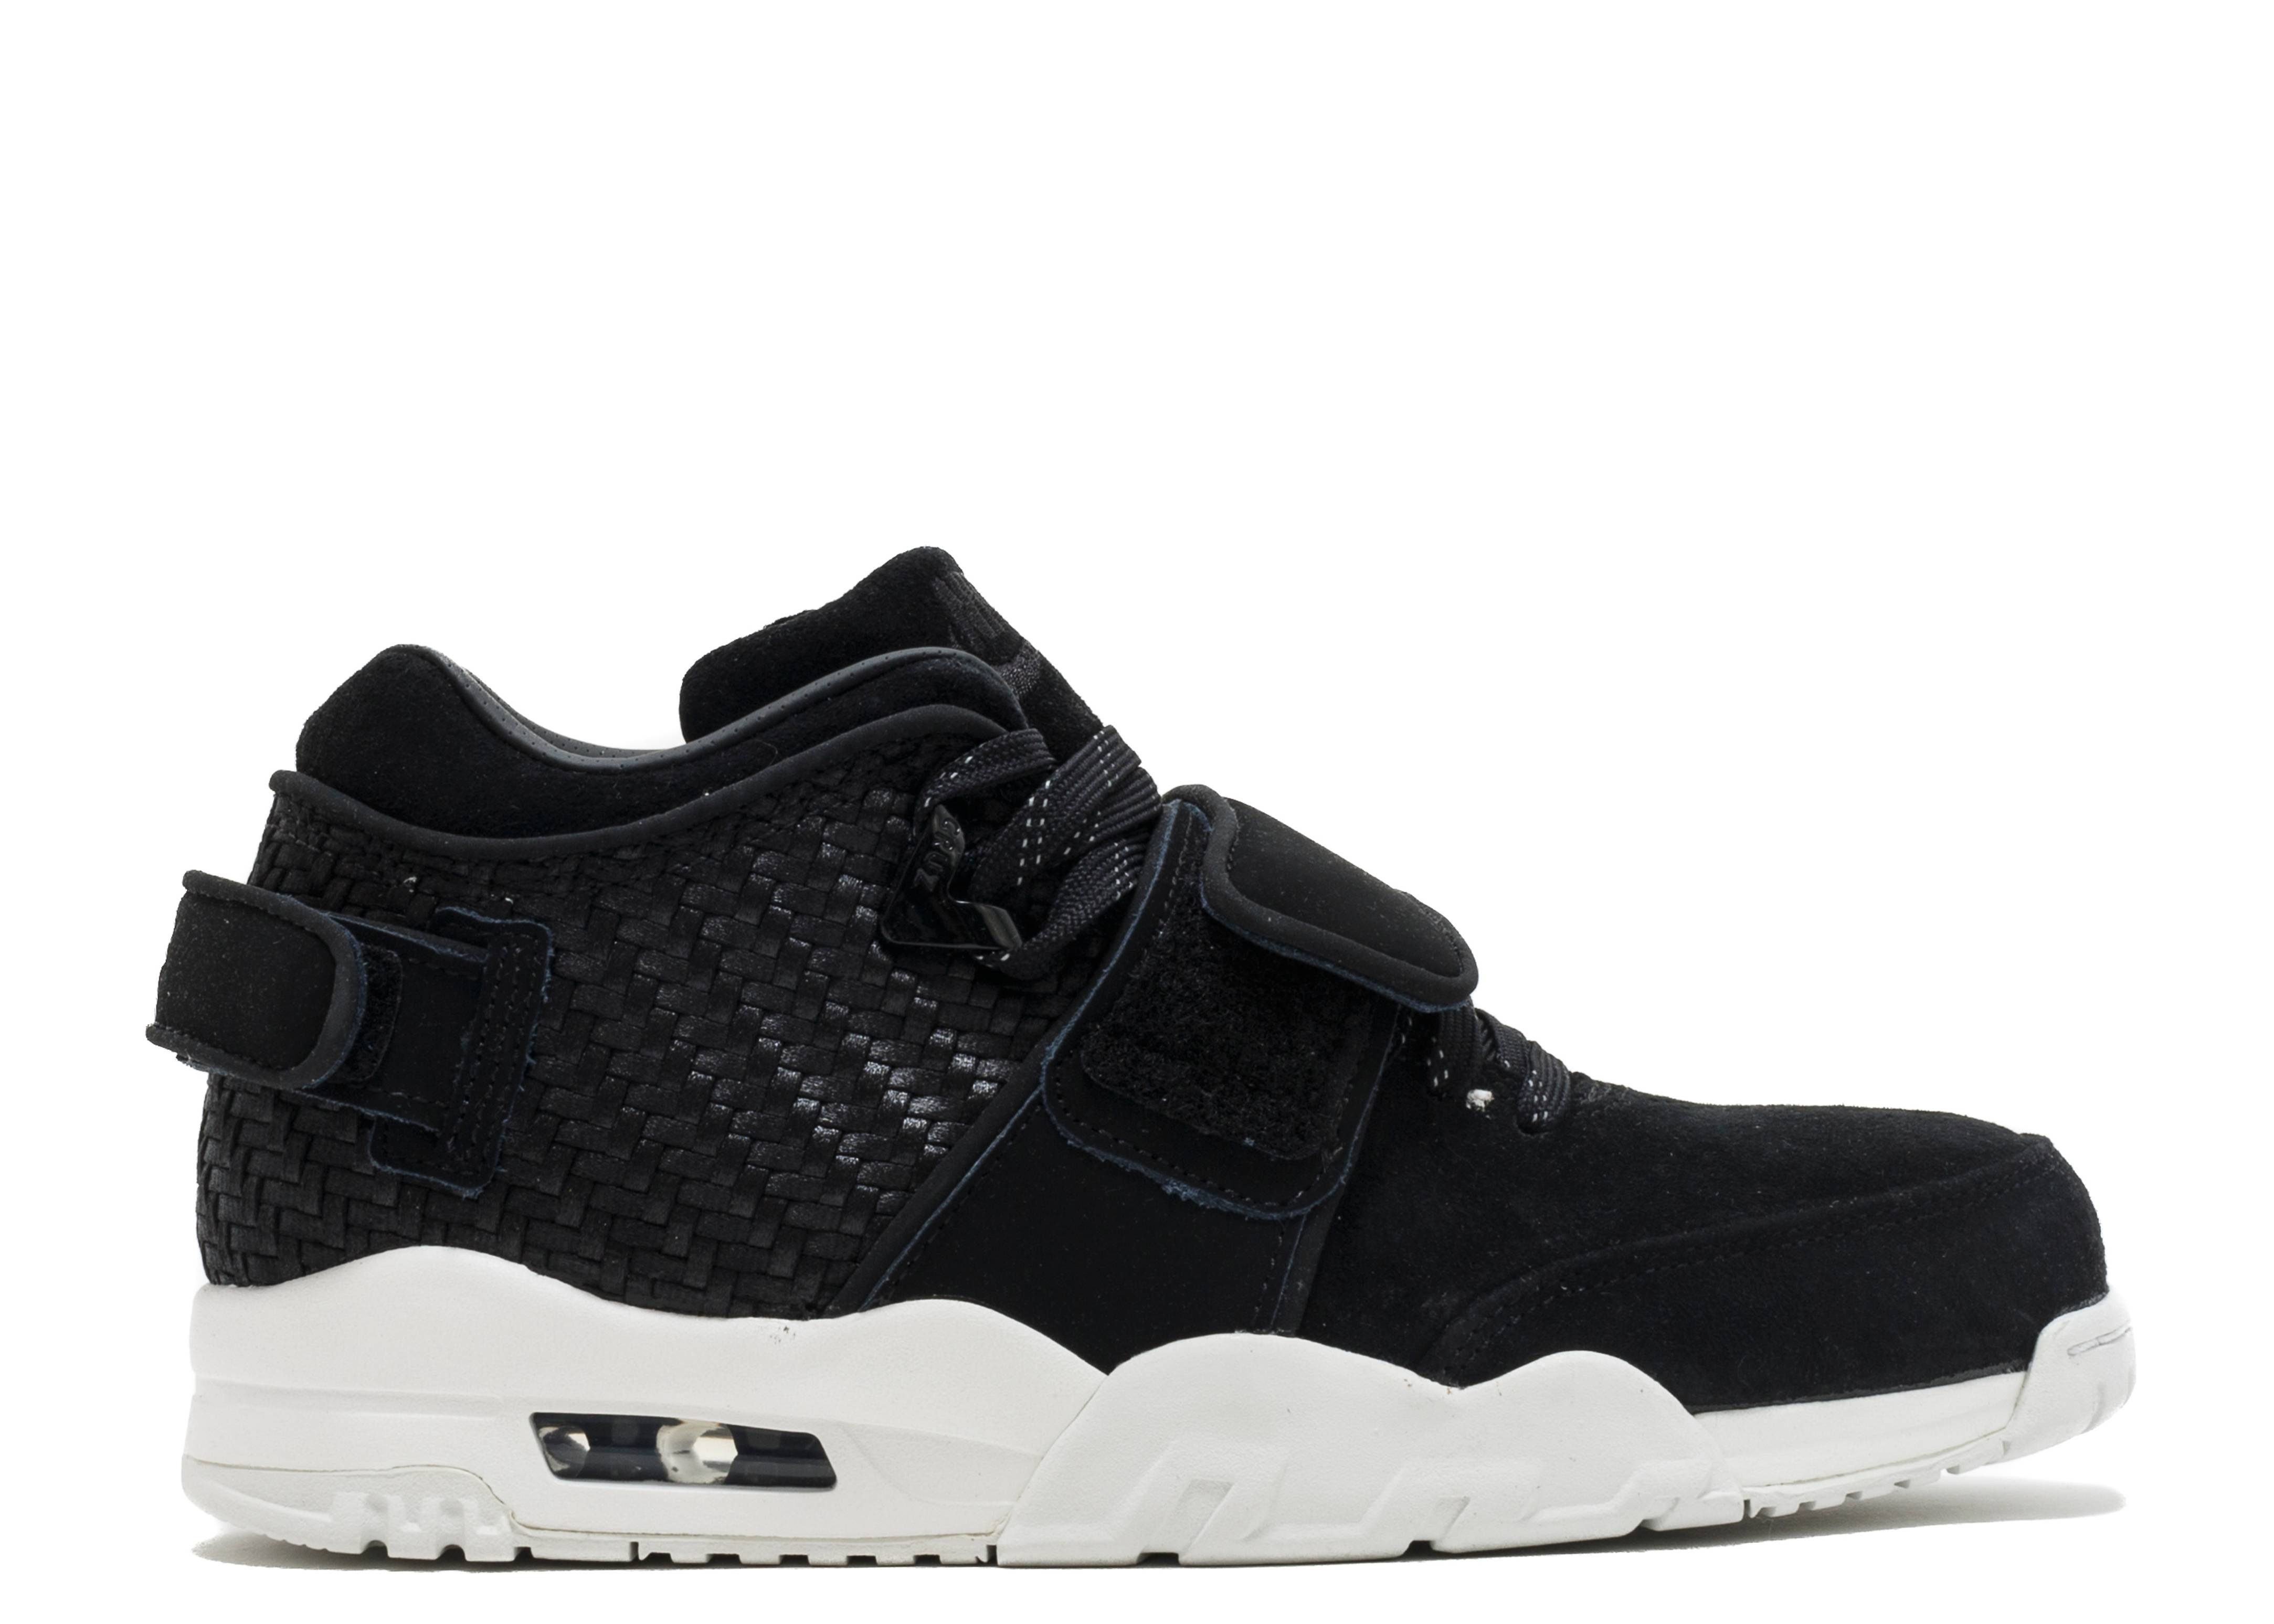 085115a6d35fa Air Tr. V. Cruz - Nike - 777535 004 - black black-black-summit white ...